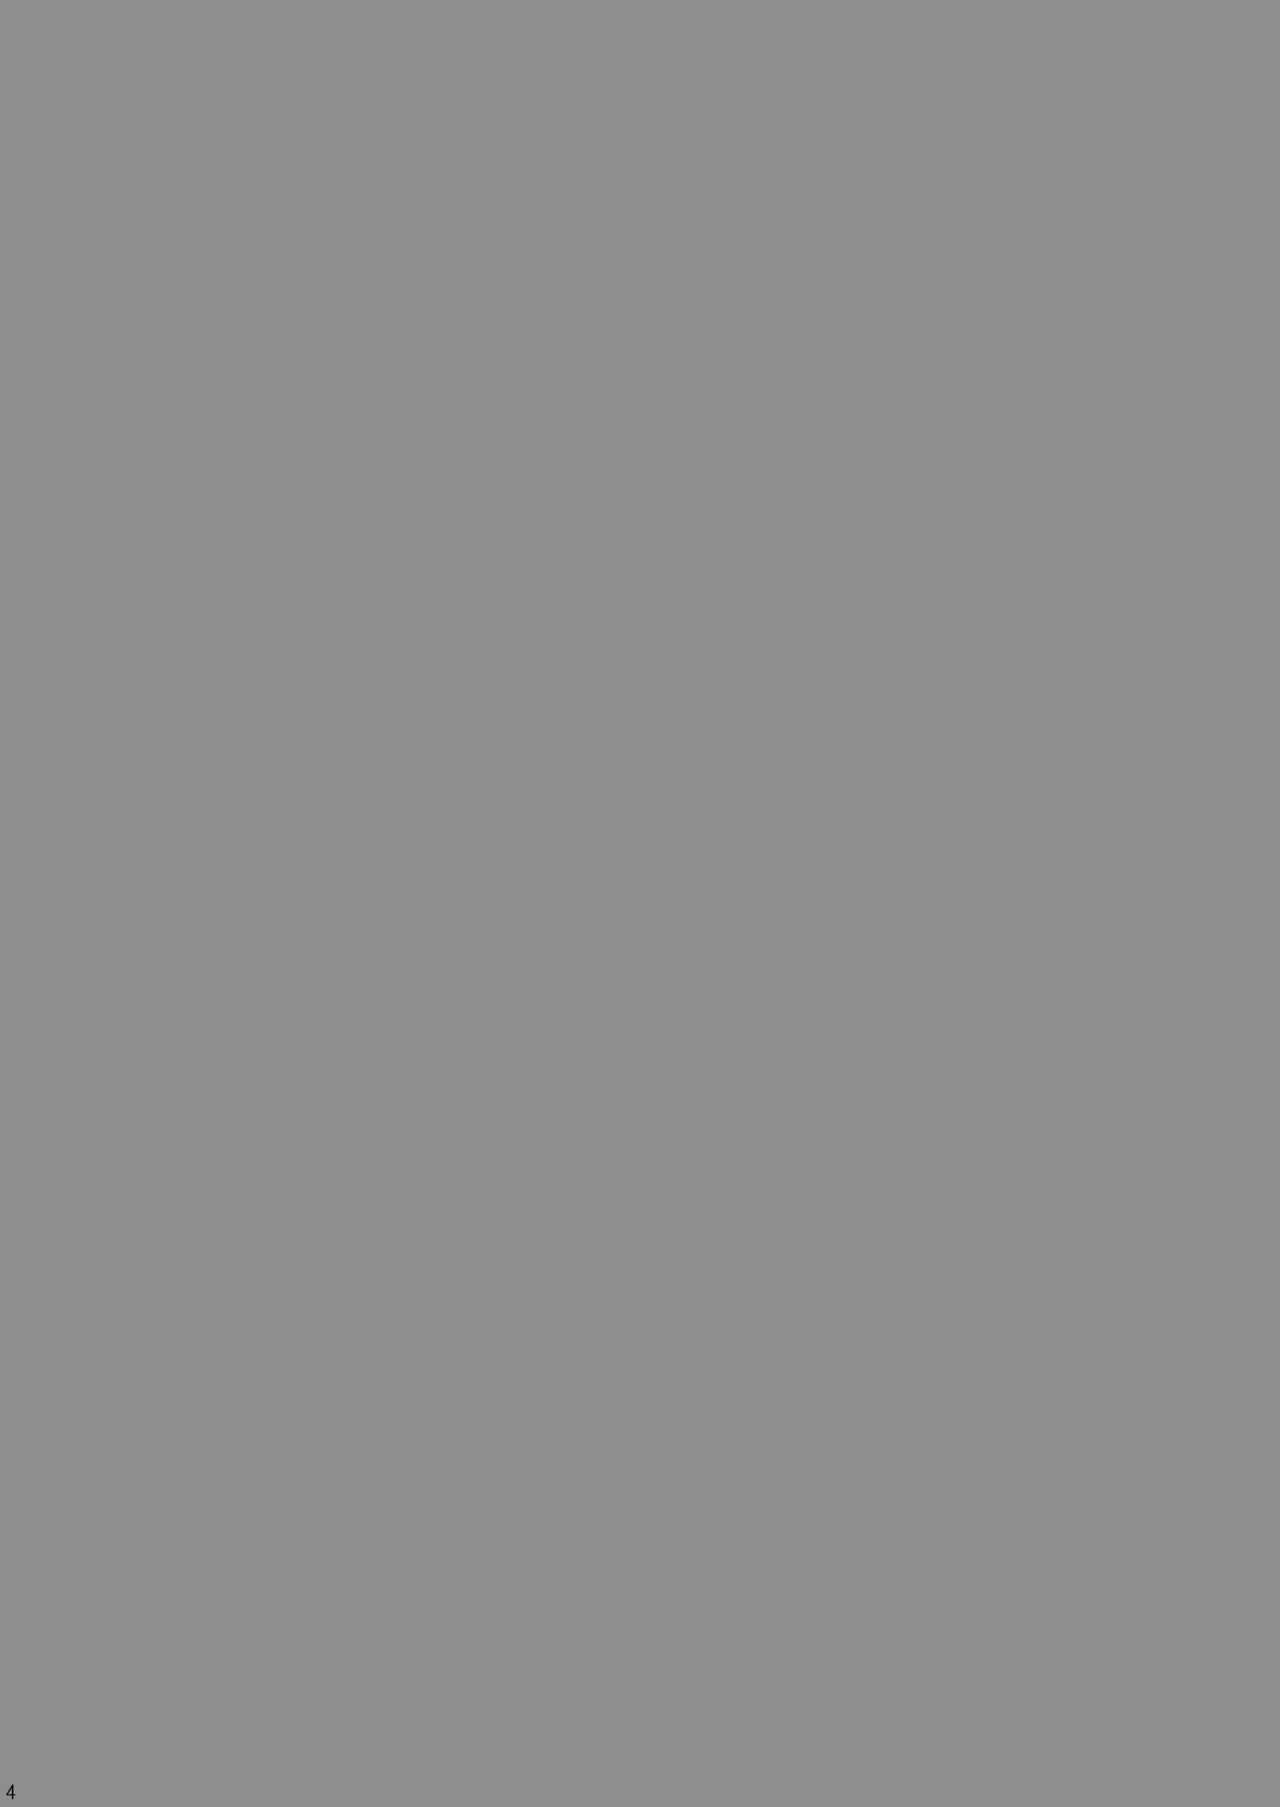 [Asanoya (Kittsu)] Toraware Hime III - Asuna Nakadashi 100-nin Dekiru ka na   Hostage Princess III (Sword Art Online) [English] [HypnoMangaEditor] [Digital] 2